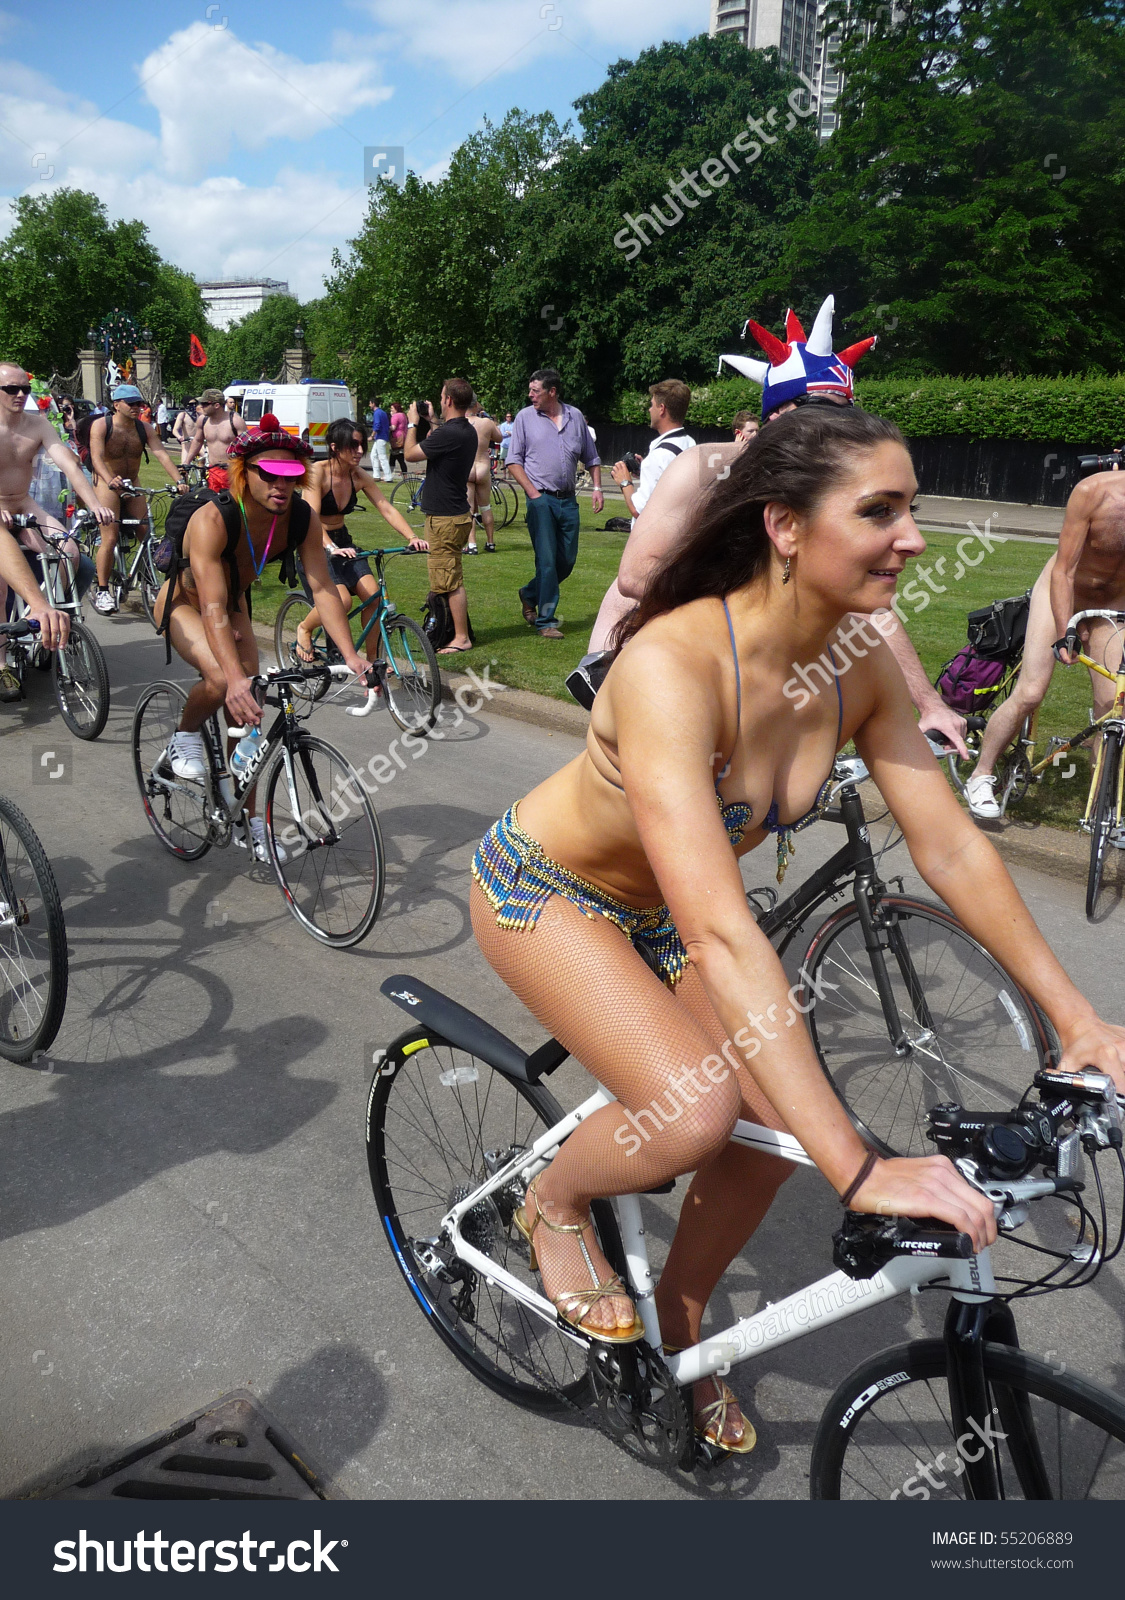 London June 12 World Naked Bike Stock Photo 55206889.